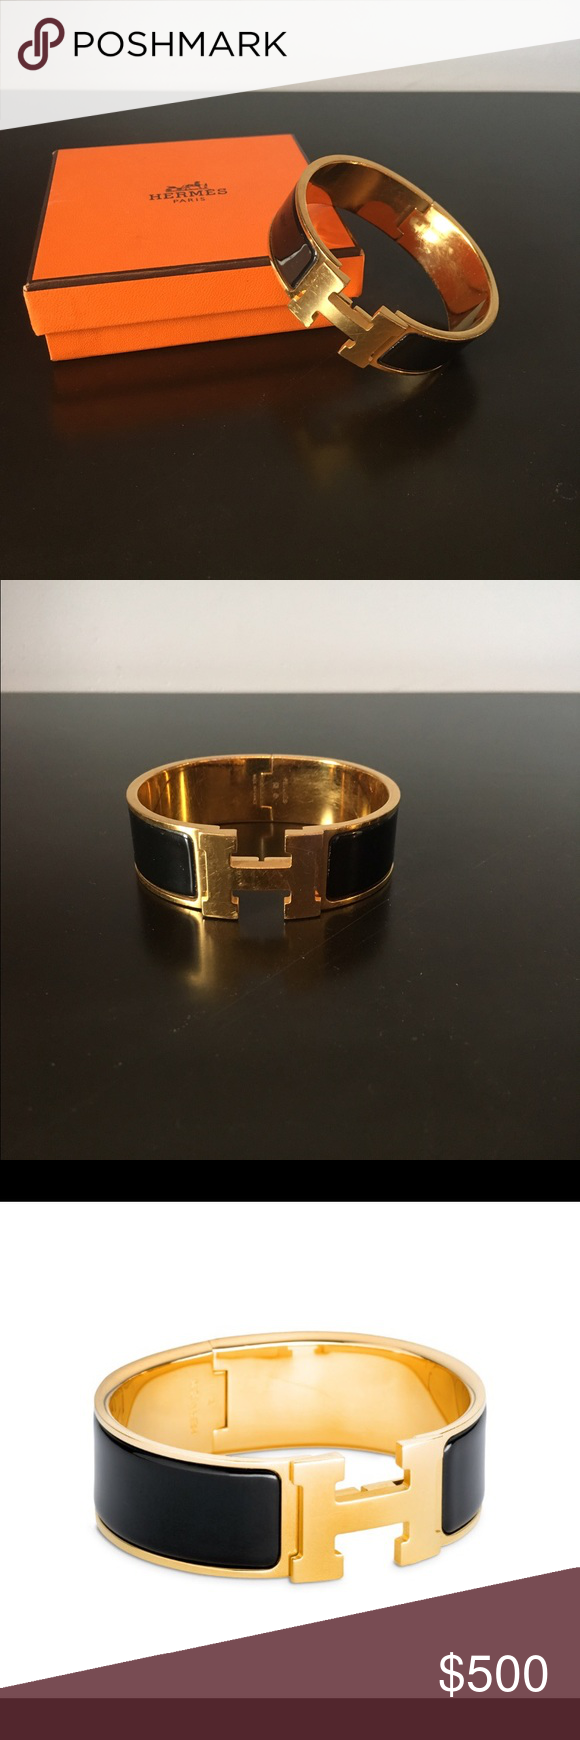 Hermes Clic Clac H Bracelet Black Enamel With Gold Plating Size Gm 1 Inch Wide